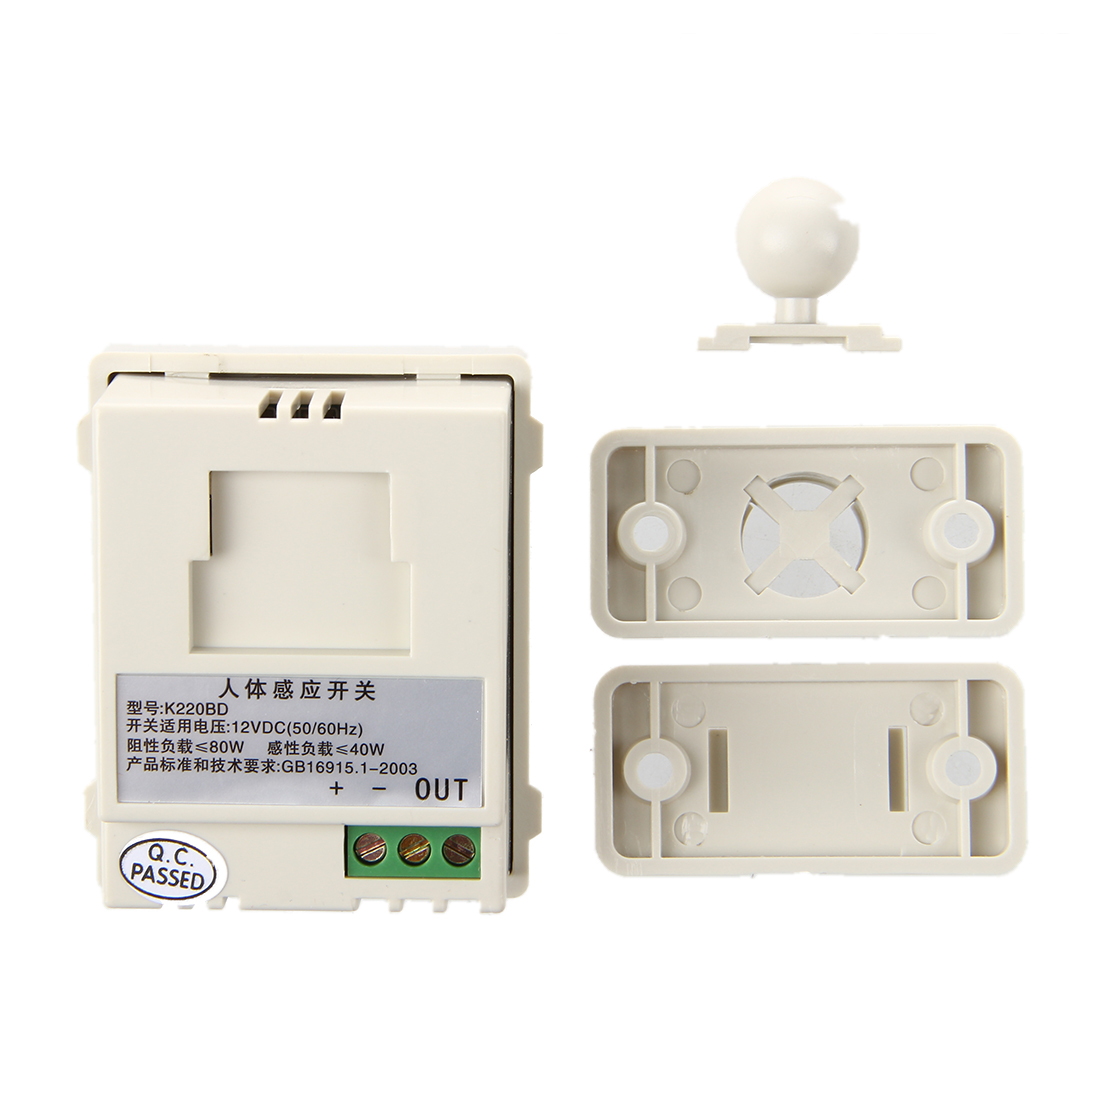 SHGO HOT-TD 12V IR Infrared Motion Sensor Automatic light switch for LED light energy saving mayitr ir infrared motion switch sensor automatic on off lights lamps switch saving energy 12v